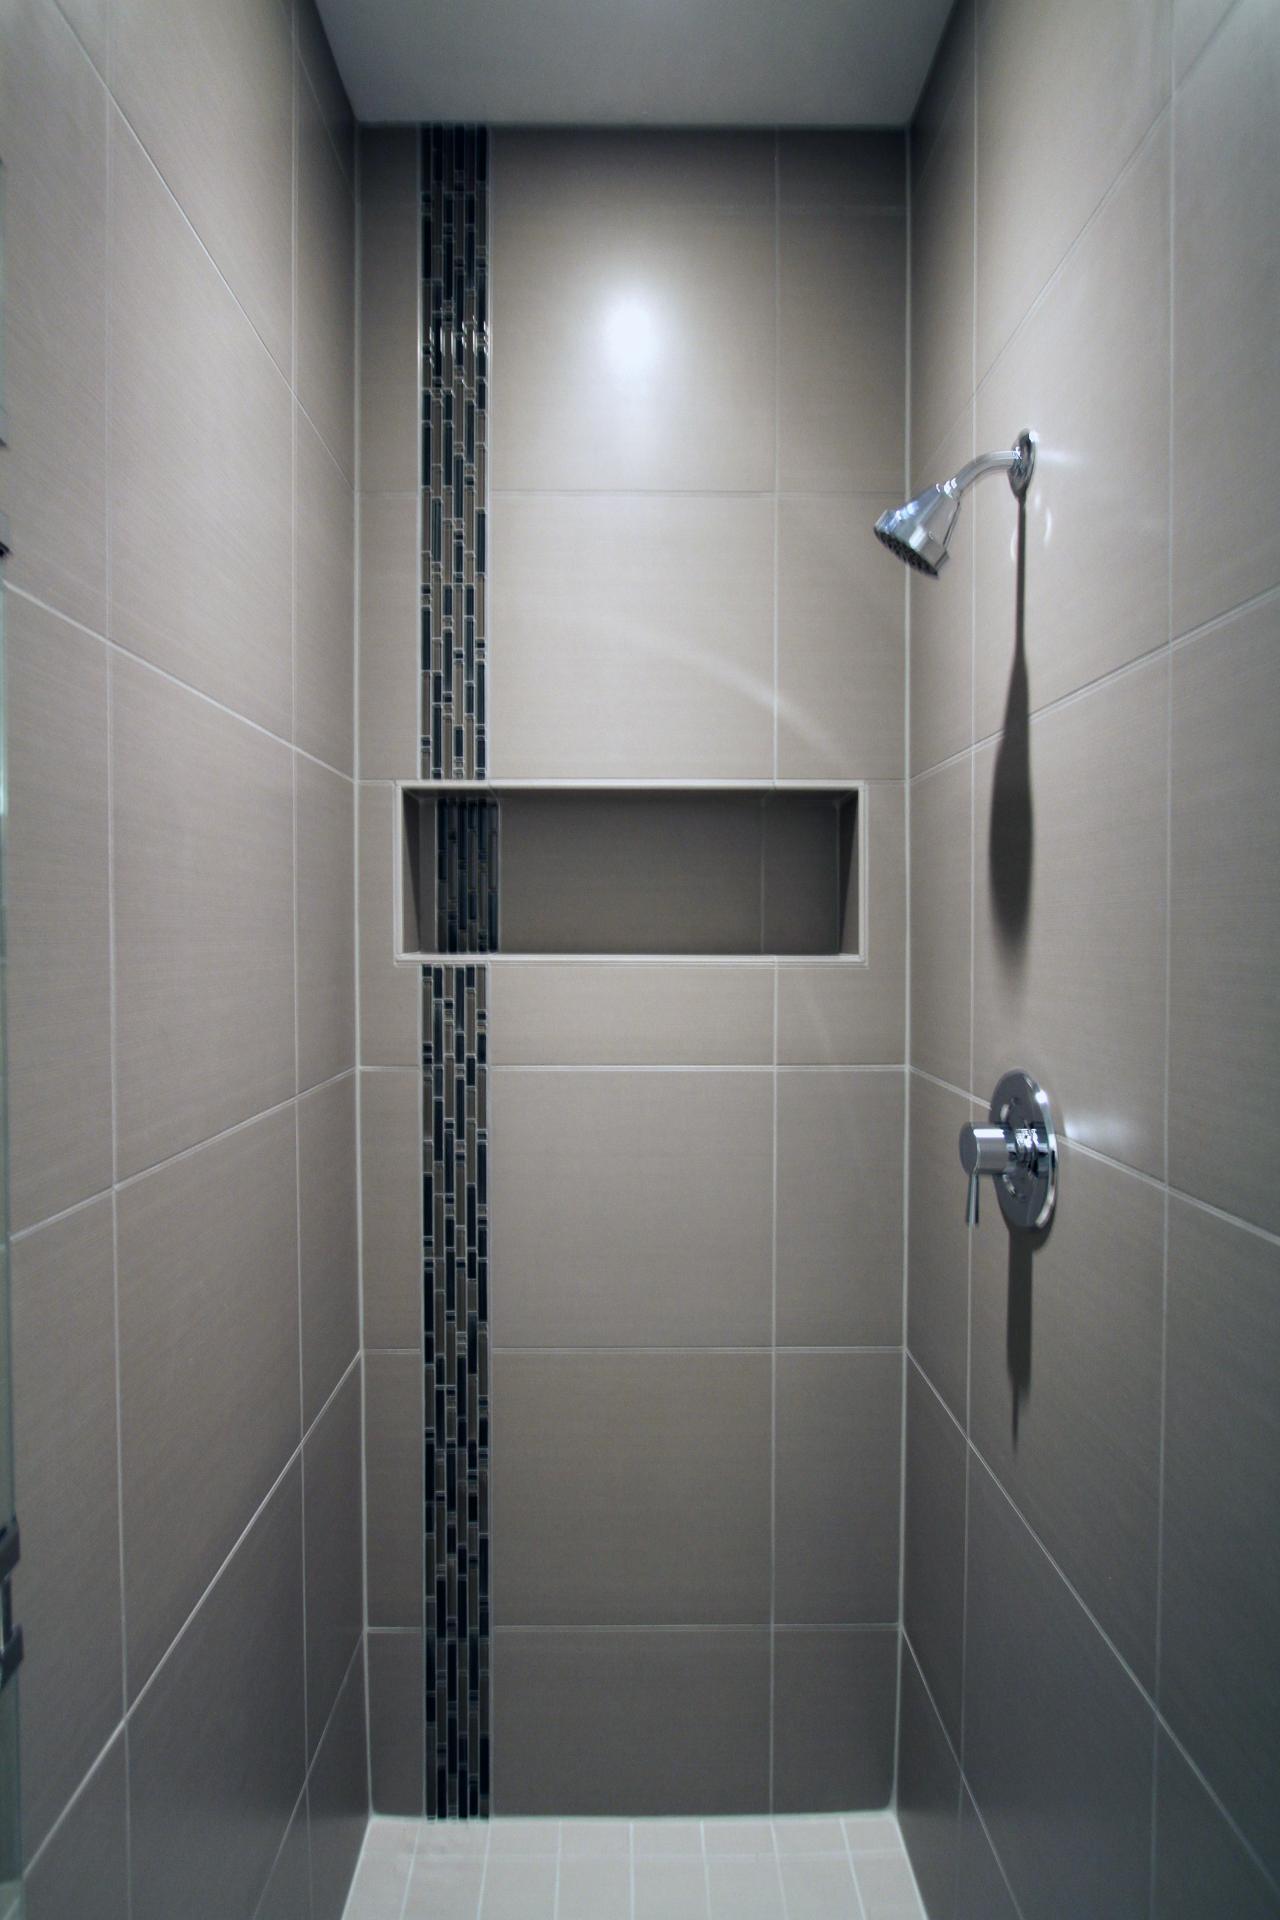 Por Tile For Bathrooms - Bathroom Design Ideas Por Bathroom Tile Shower Designs on bathroom tile designs product, bathtub tile designs, bathroom ideas, shower wall tile designs, bathroom floor tile, bathroom sinks, stand up shower tile designs, shower tile layout designs, master bathroom designs, tub tile designs, large tile shower designs, shower tile ideas designs, best walk-in shower designs, contemporary bathroom tile designs, rustic walk-in shower designs, walk-in tile shower designs, travertine tile shower designs, travertine tile bathroom designs, walk-in doorless shower designs, traditional bathroom designs,